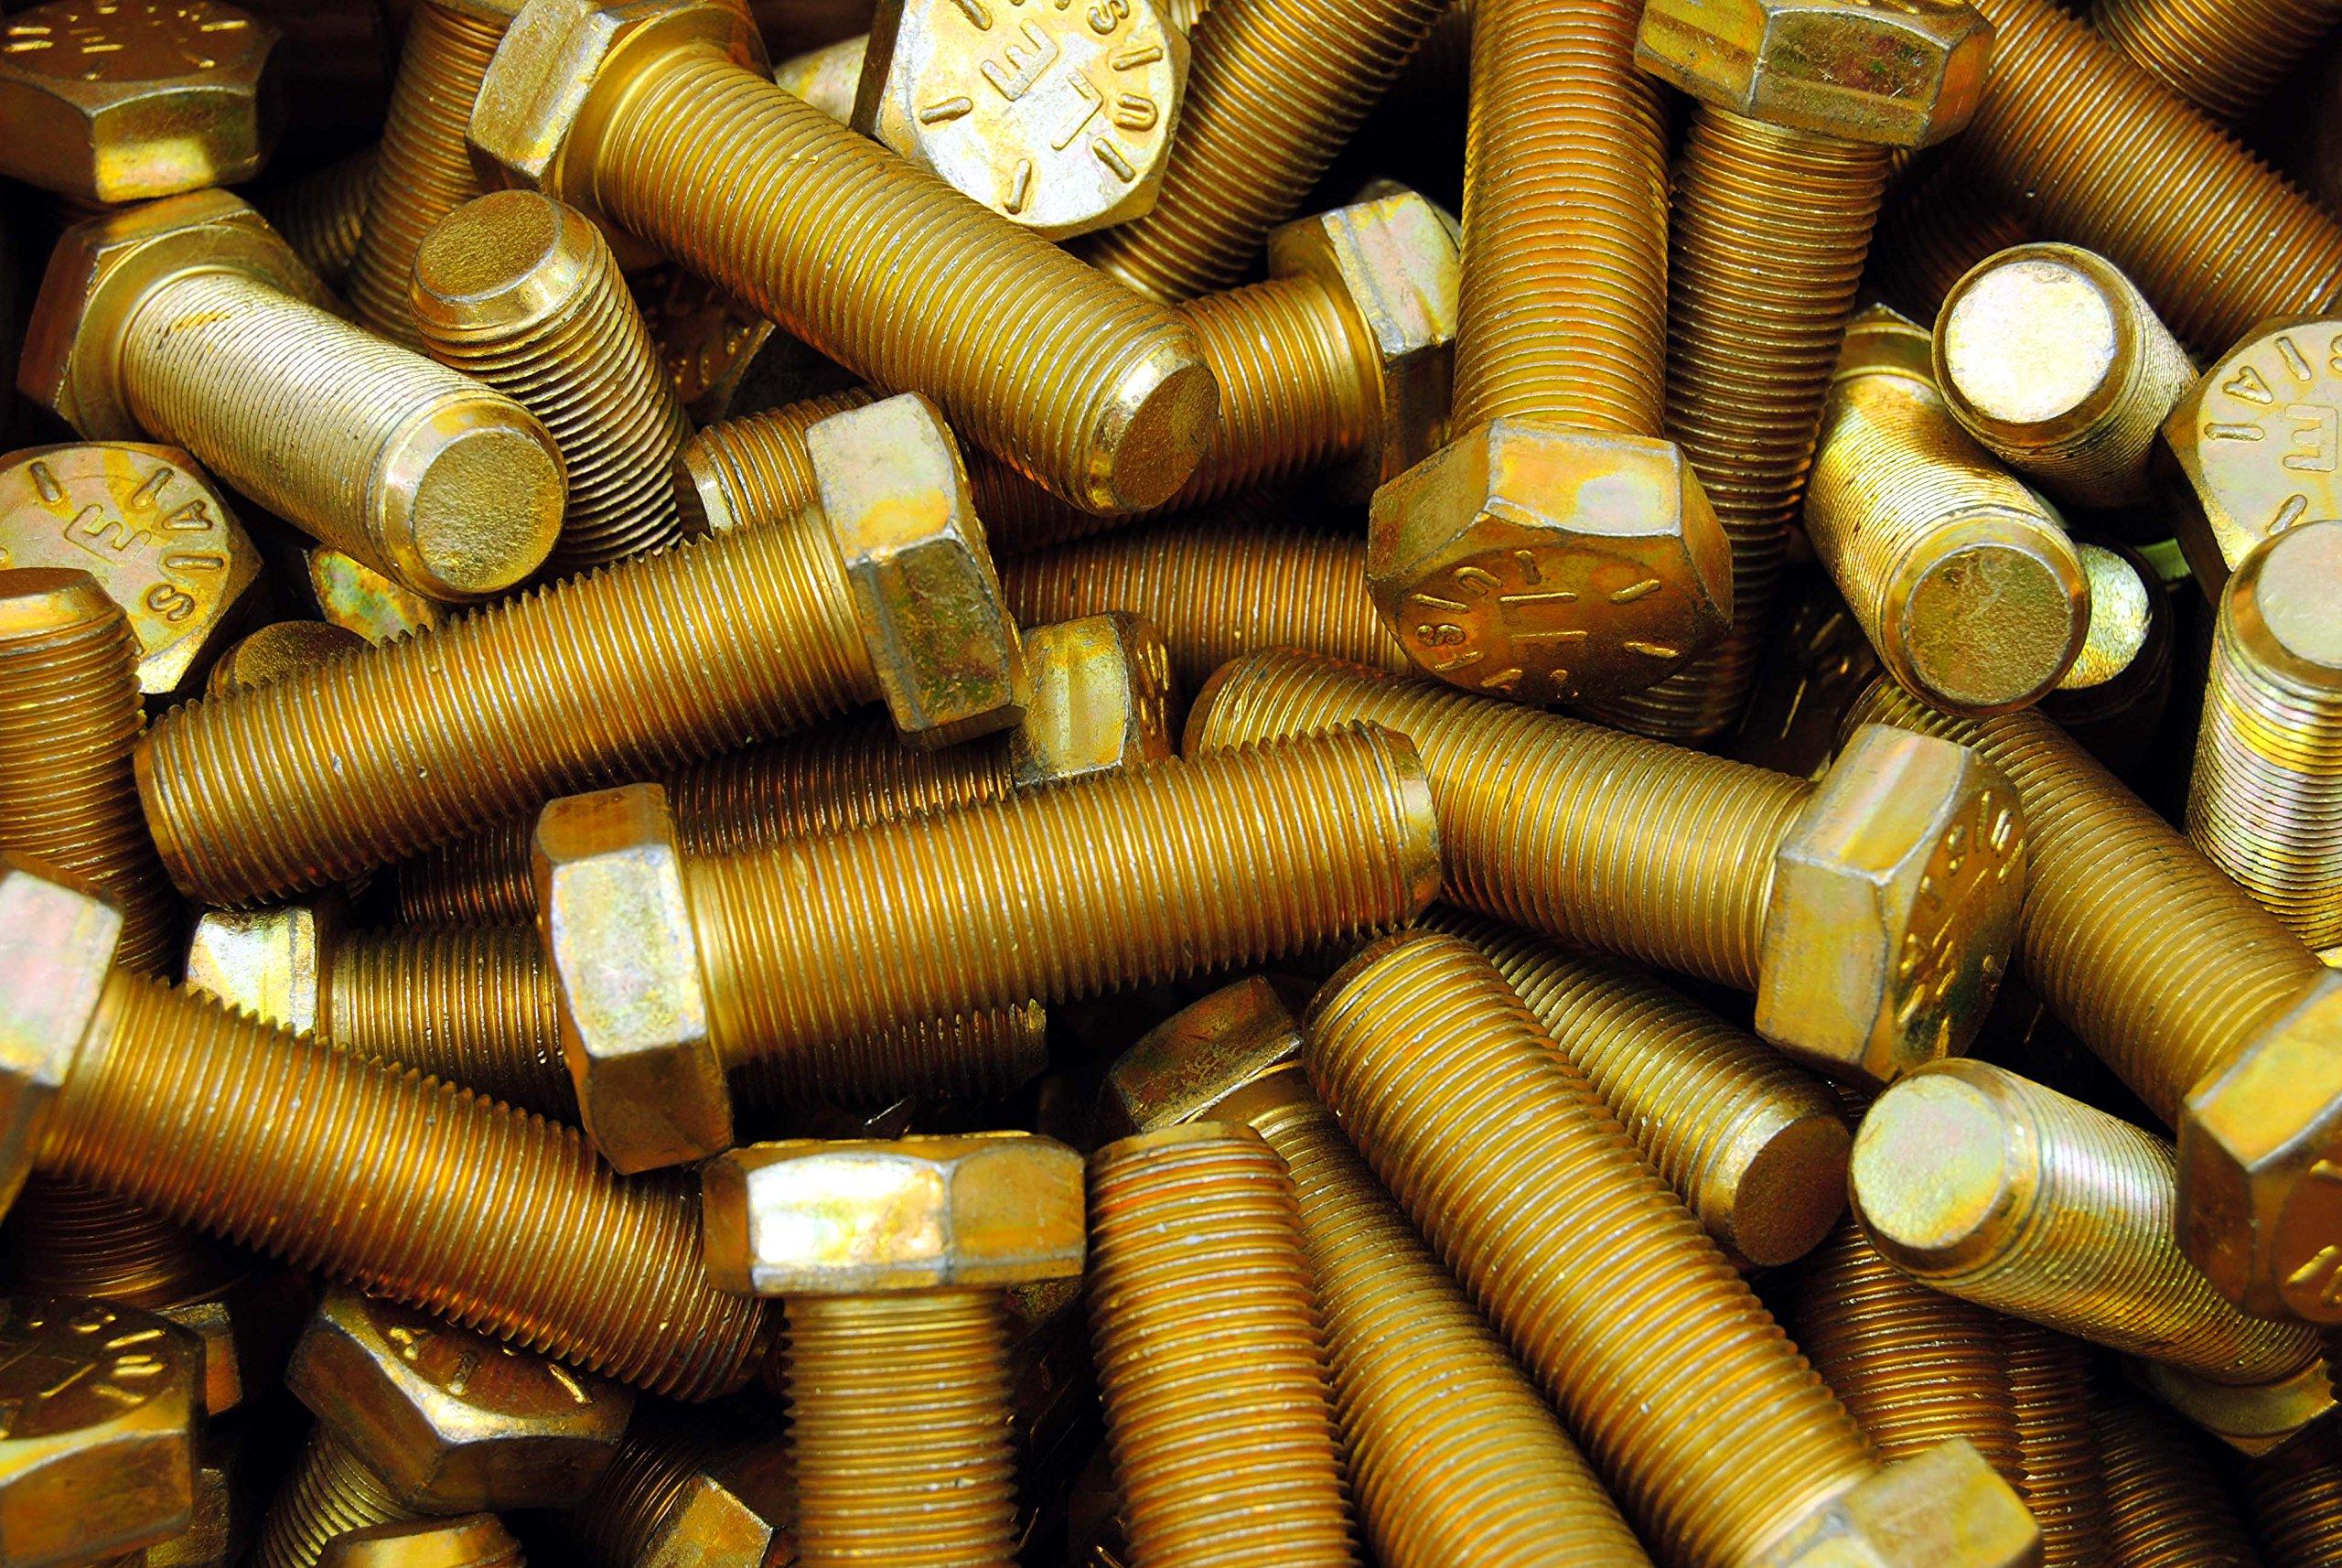 (15) Hex Head Bolts 3/4-16 x 2-1/2 Grade 8 Fine Thread Yellow Zinc USA Made by Lexar Industrial